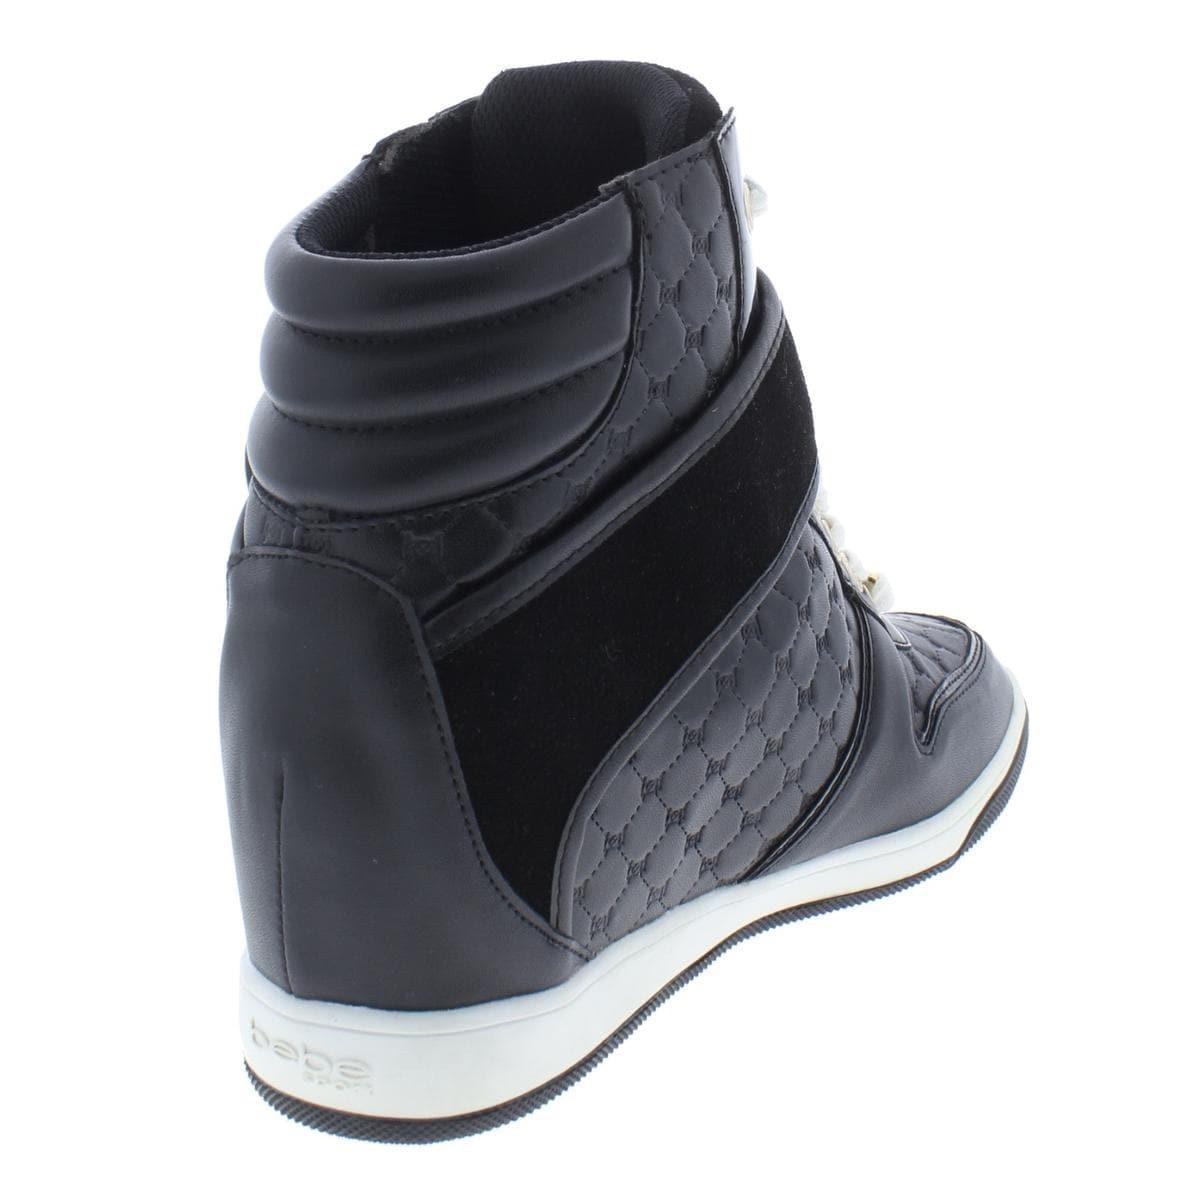 5b5954f23e74 Shop Bebe Sport Womens Colby Fashion Sneakers Faux Leather Wedge - 8.5  Medium (B